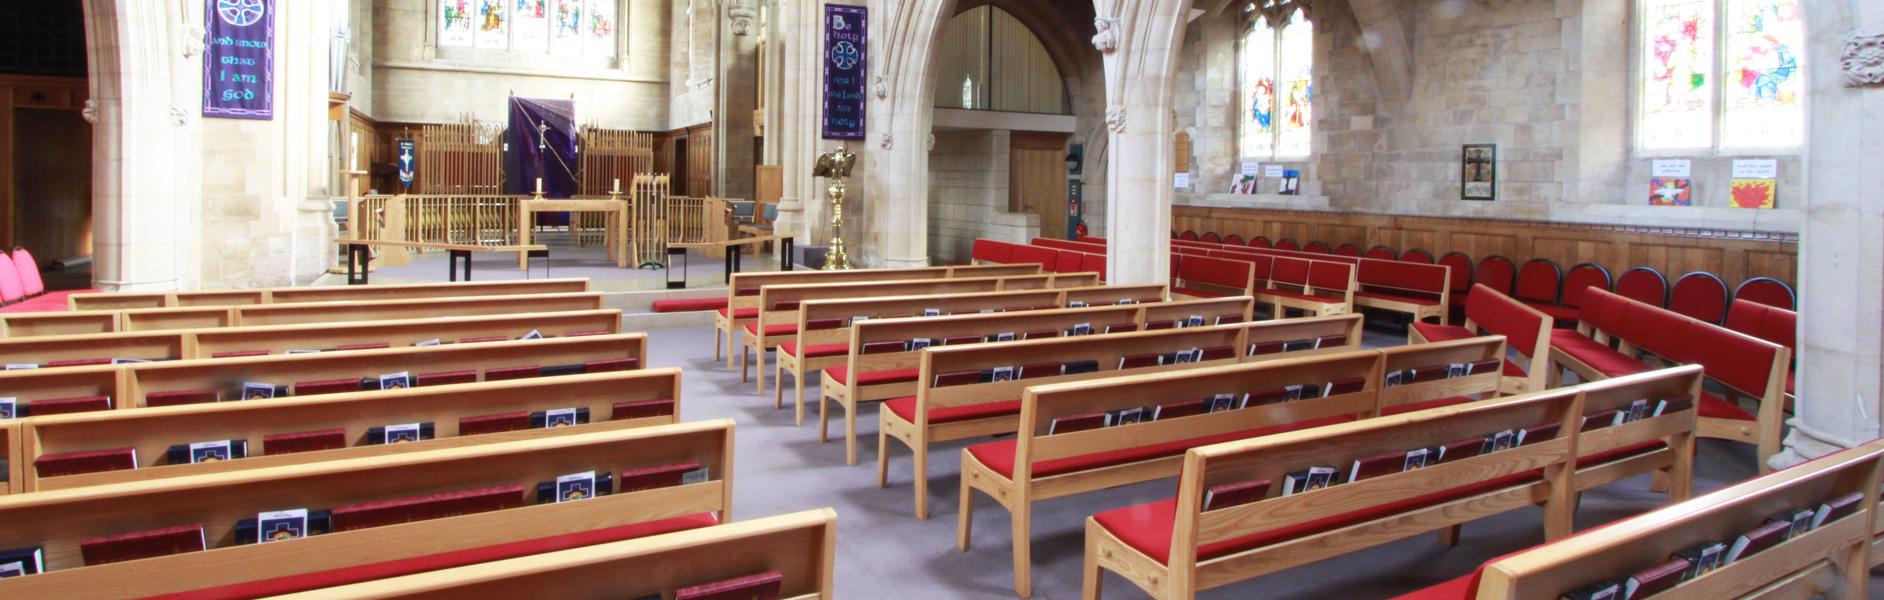 ICS projects in St. Mark's Church, Harrogate